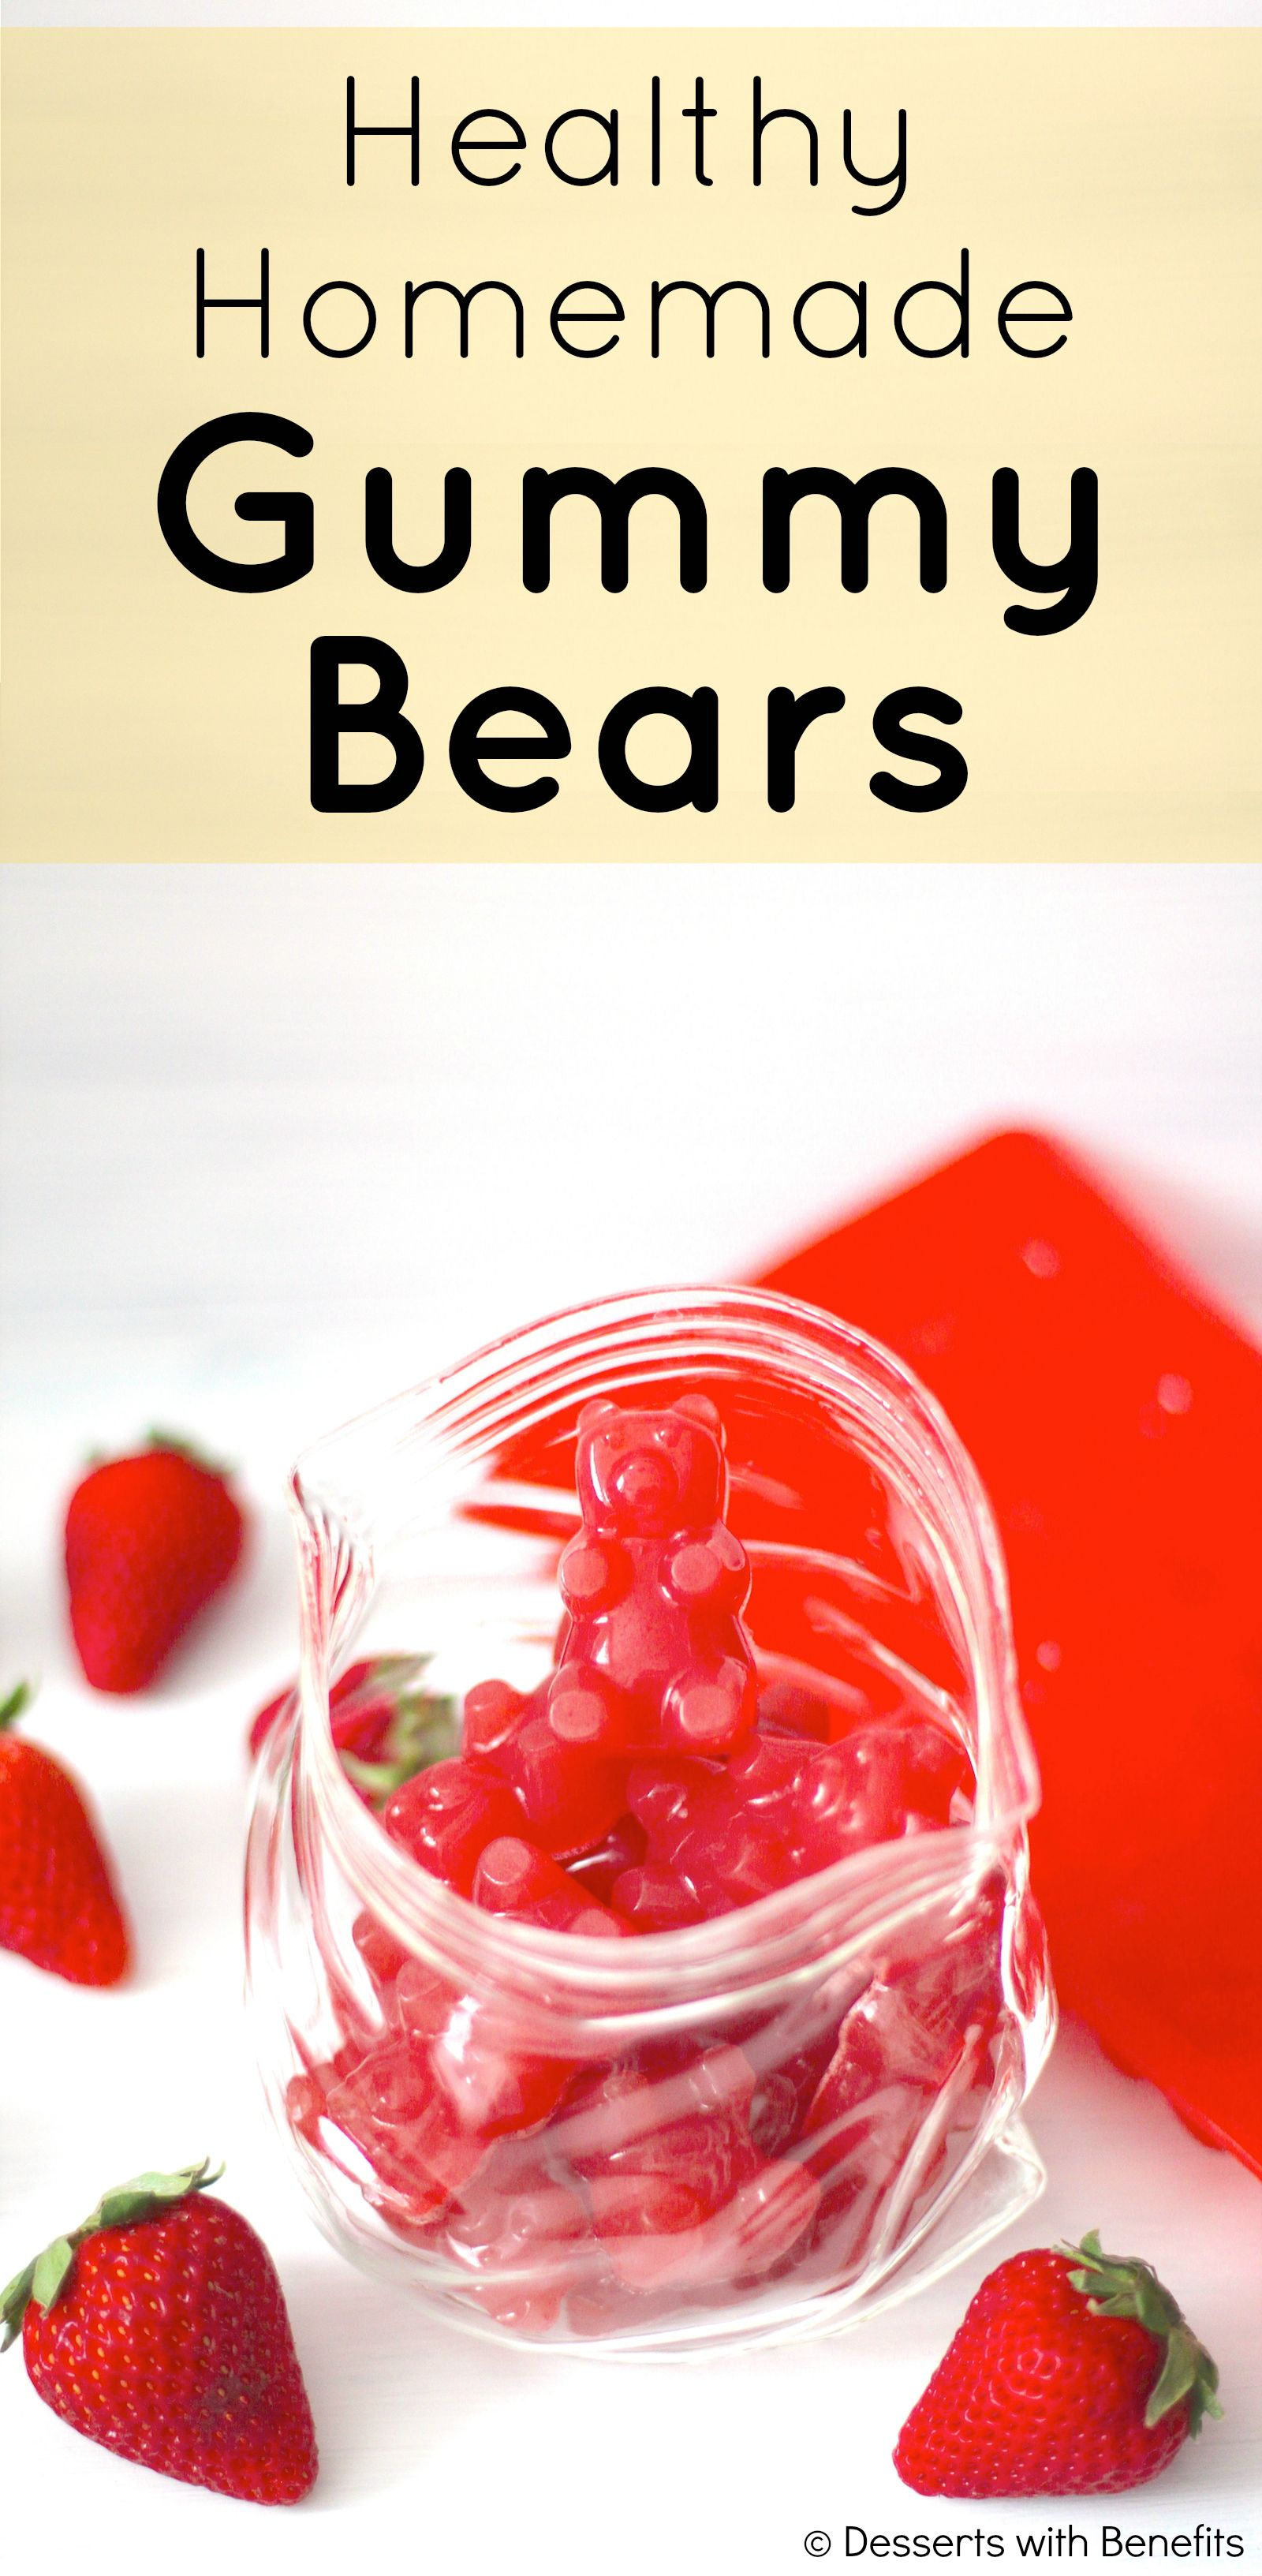 Healthy Homemade Strawberry Gummy Bears Recipe Homemade Gummy Bears Food Snacks